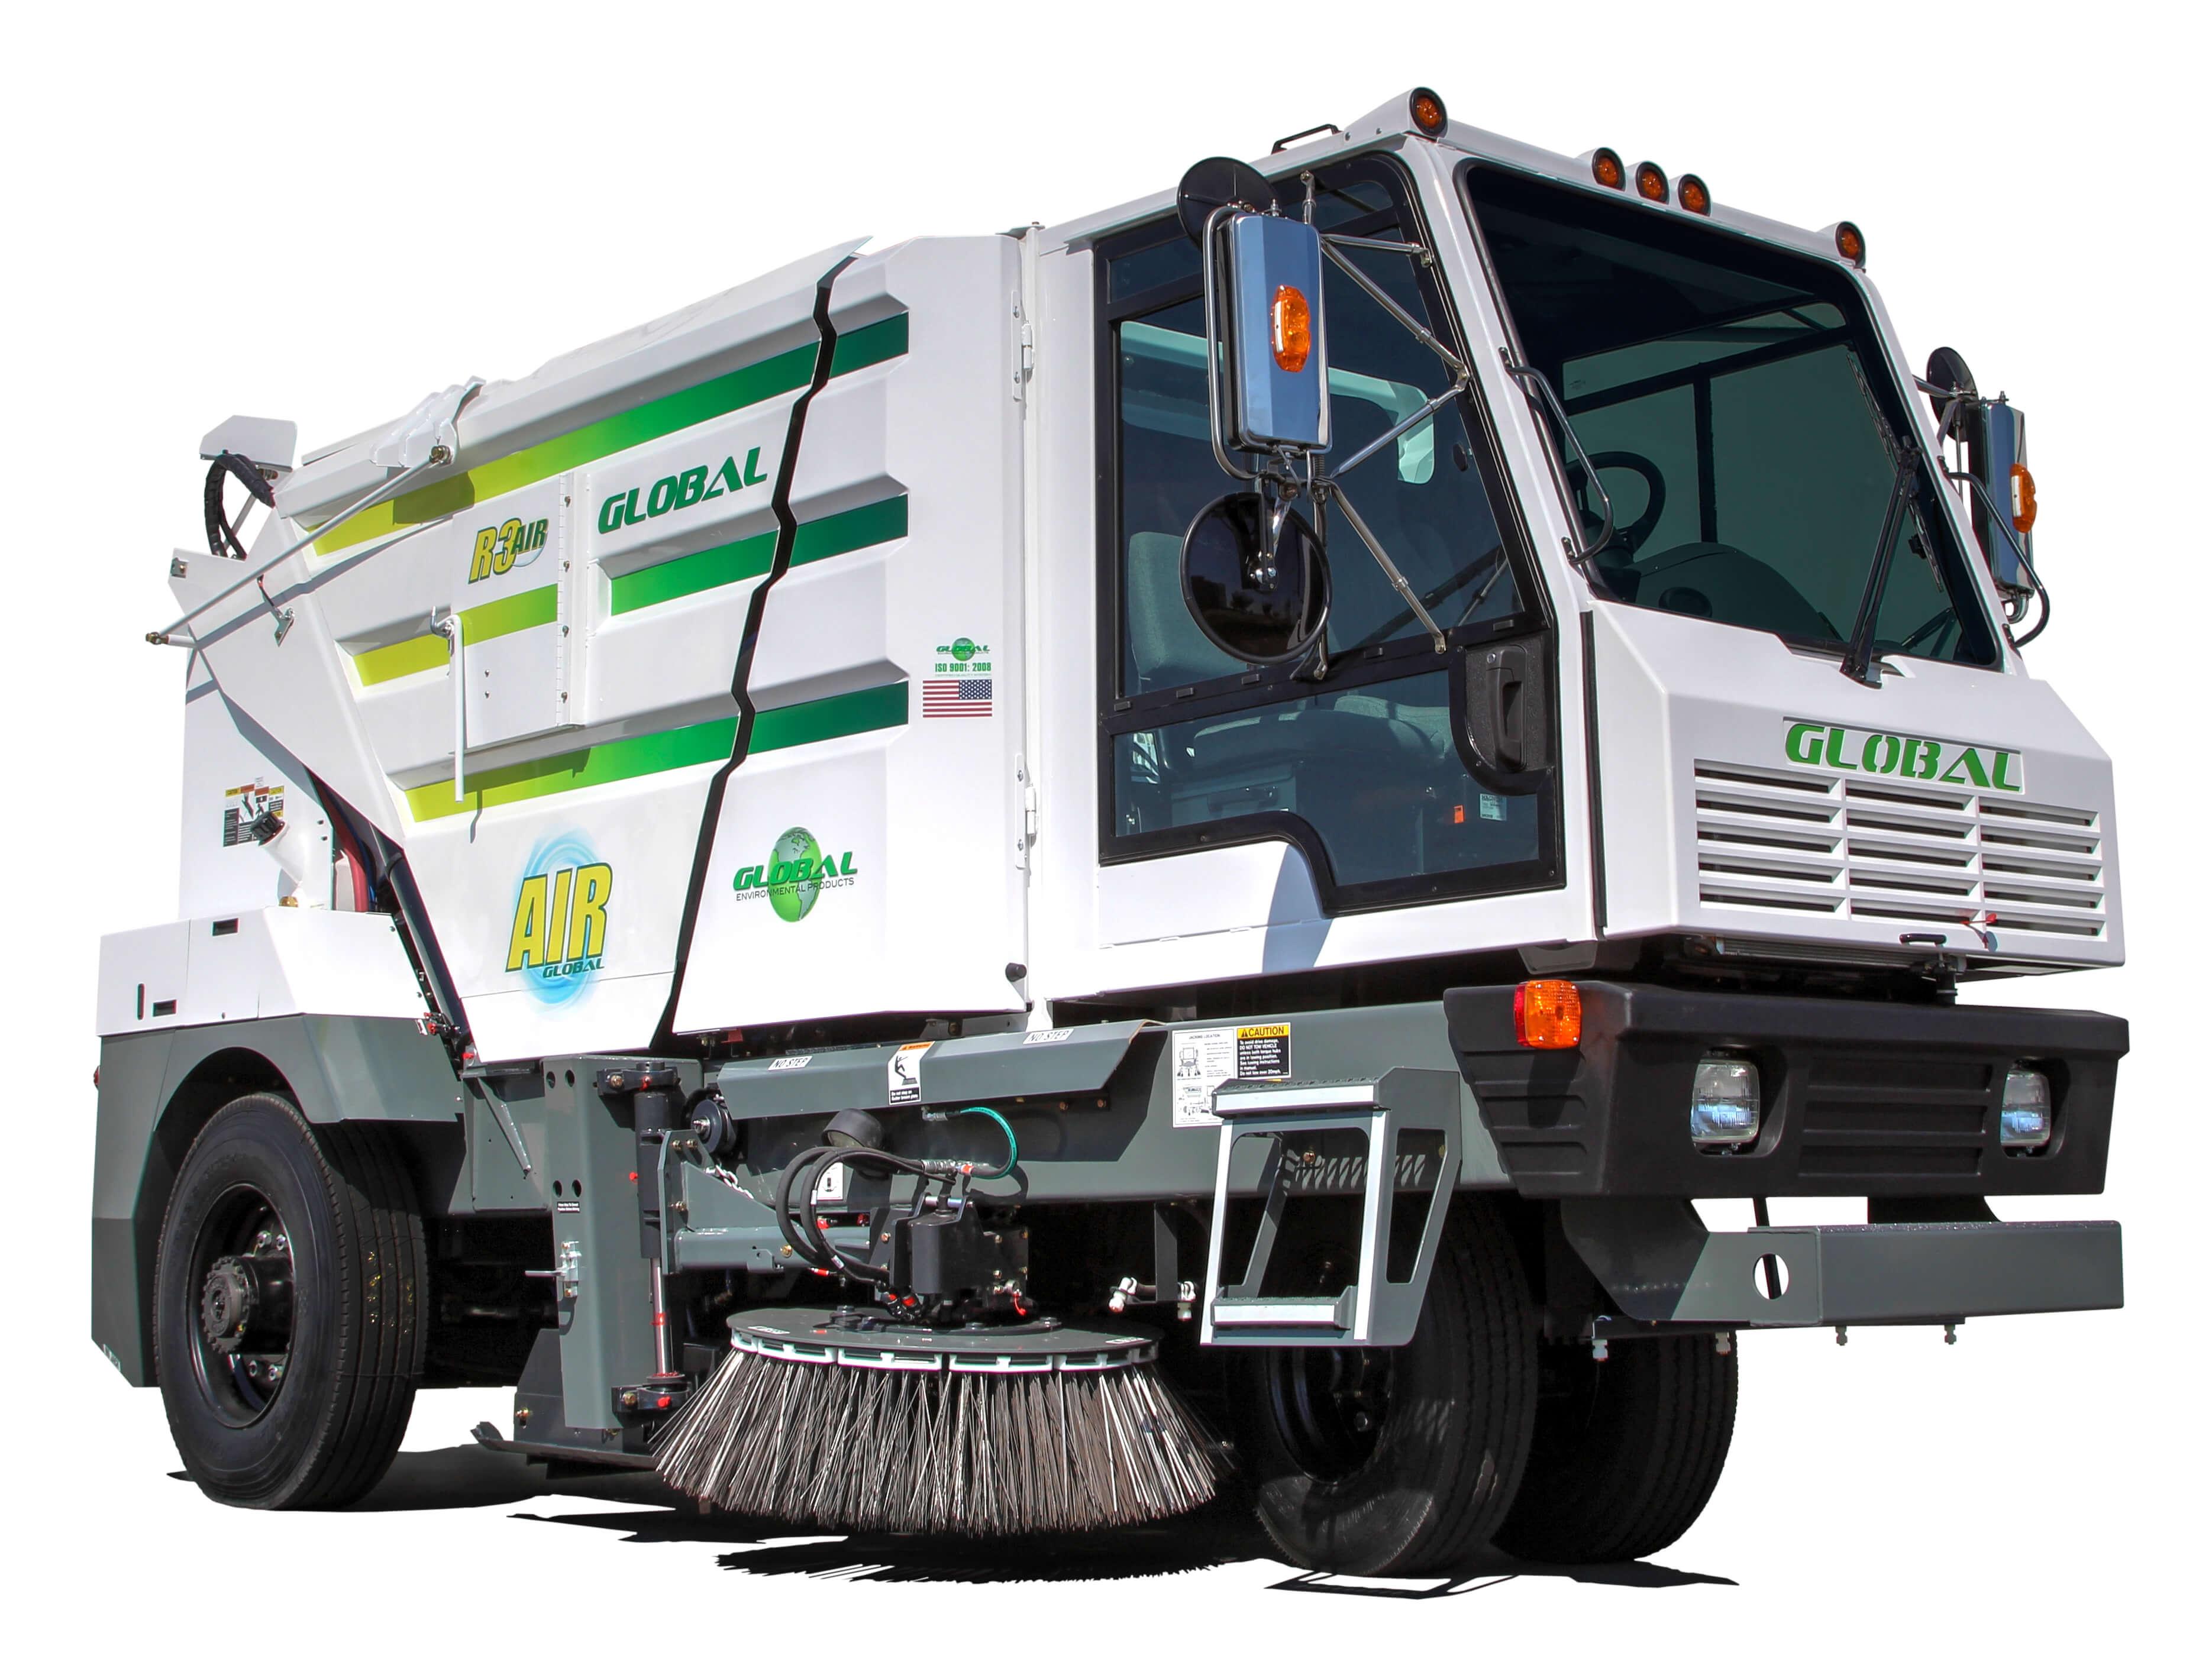 Global Environmental R3 Three Wheeled Street Sweeper- Stock Photo